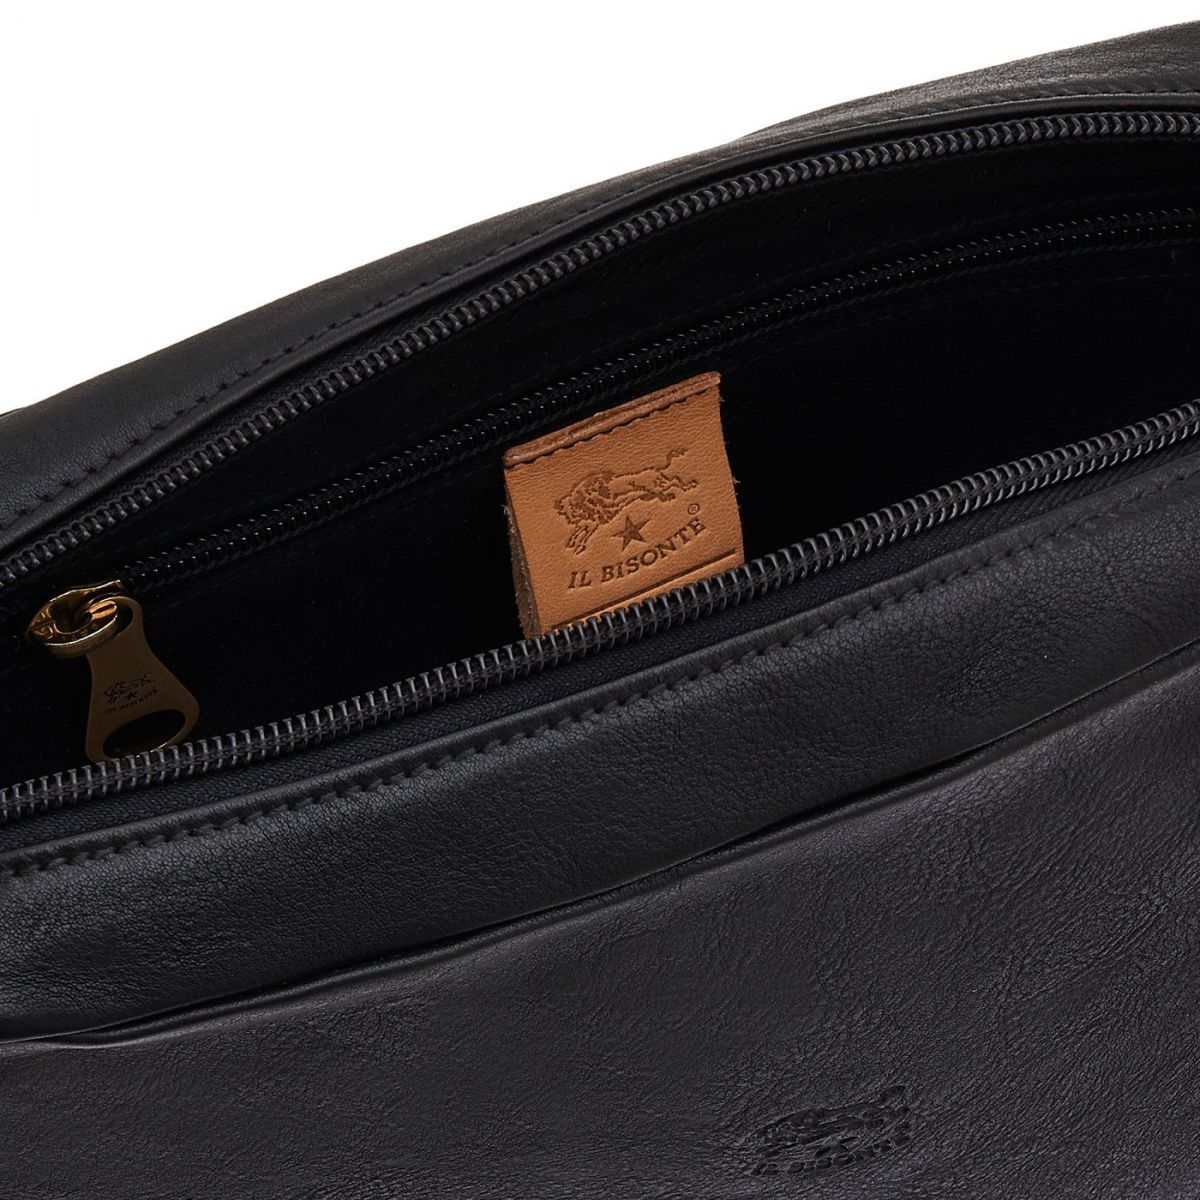 Men's Crossbody Bag New Icon in Vintage Cowhide Leather BCR056 color Black | Details